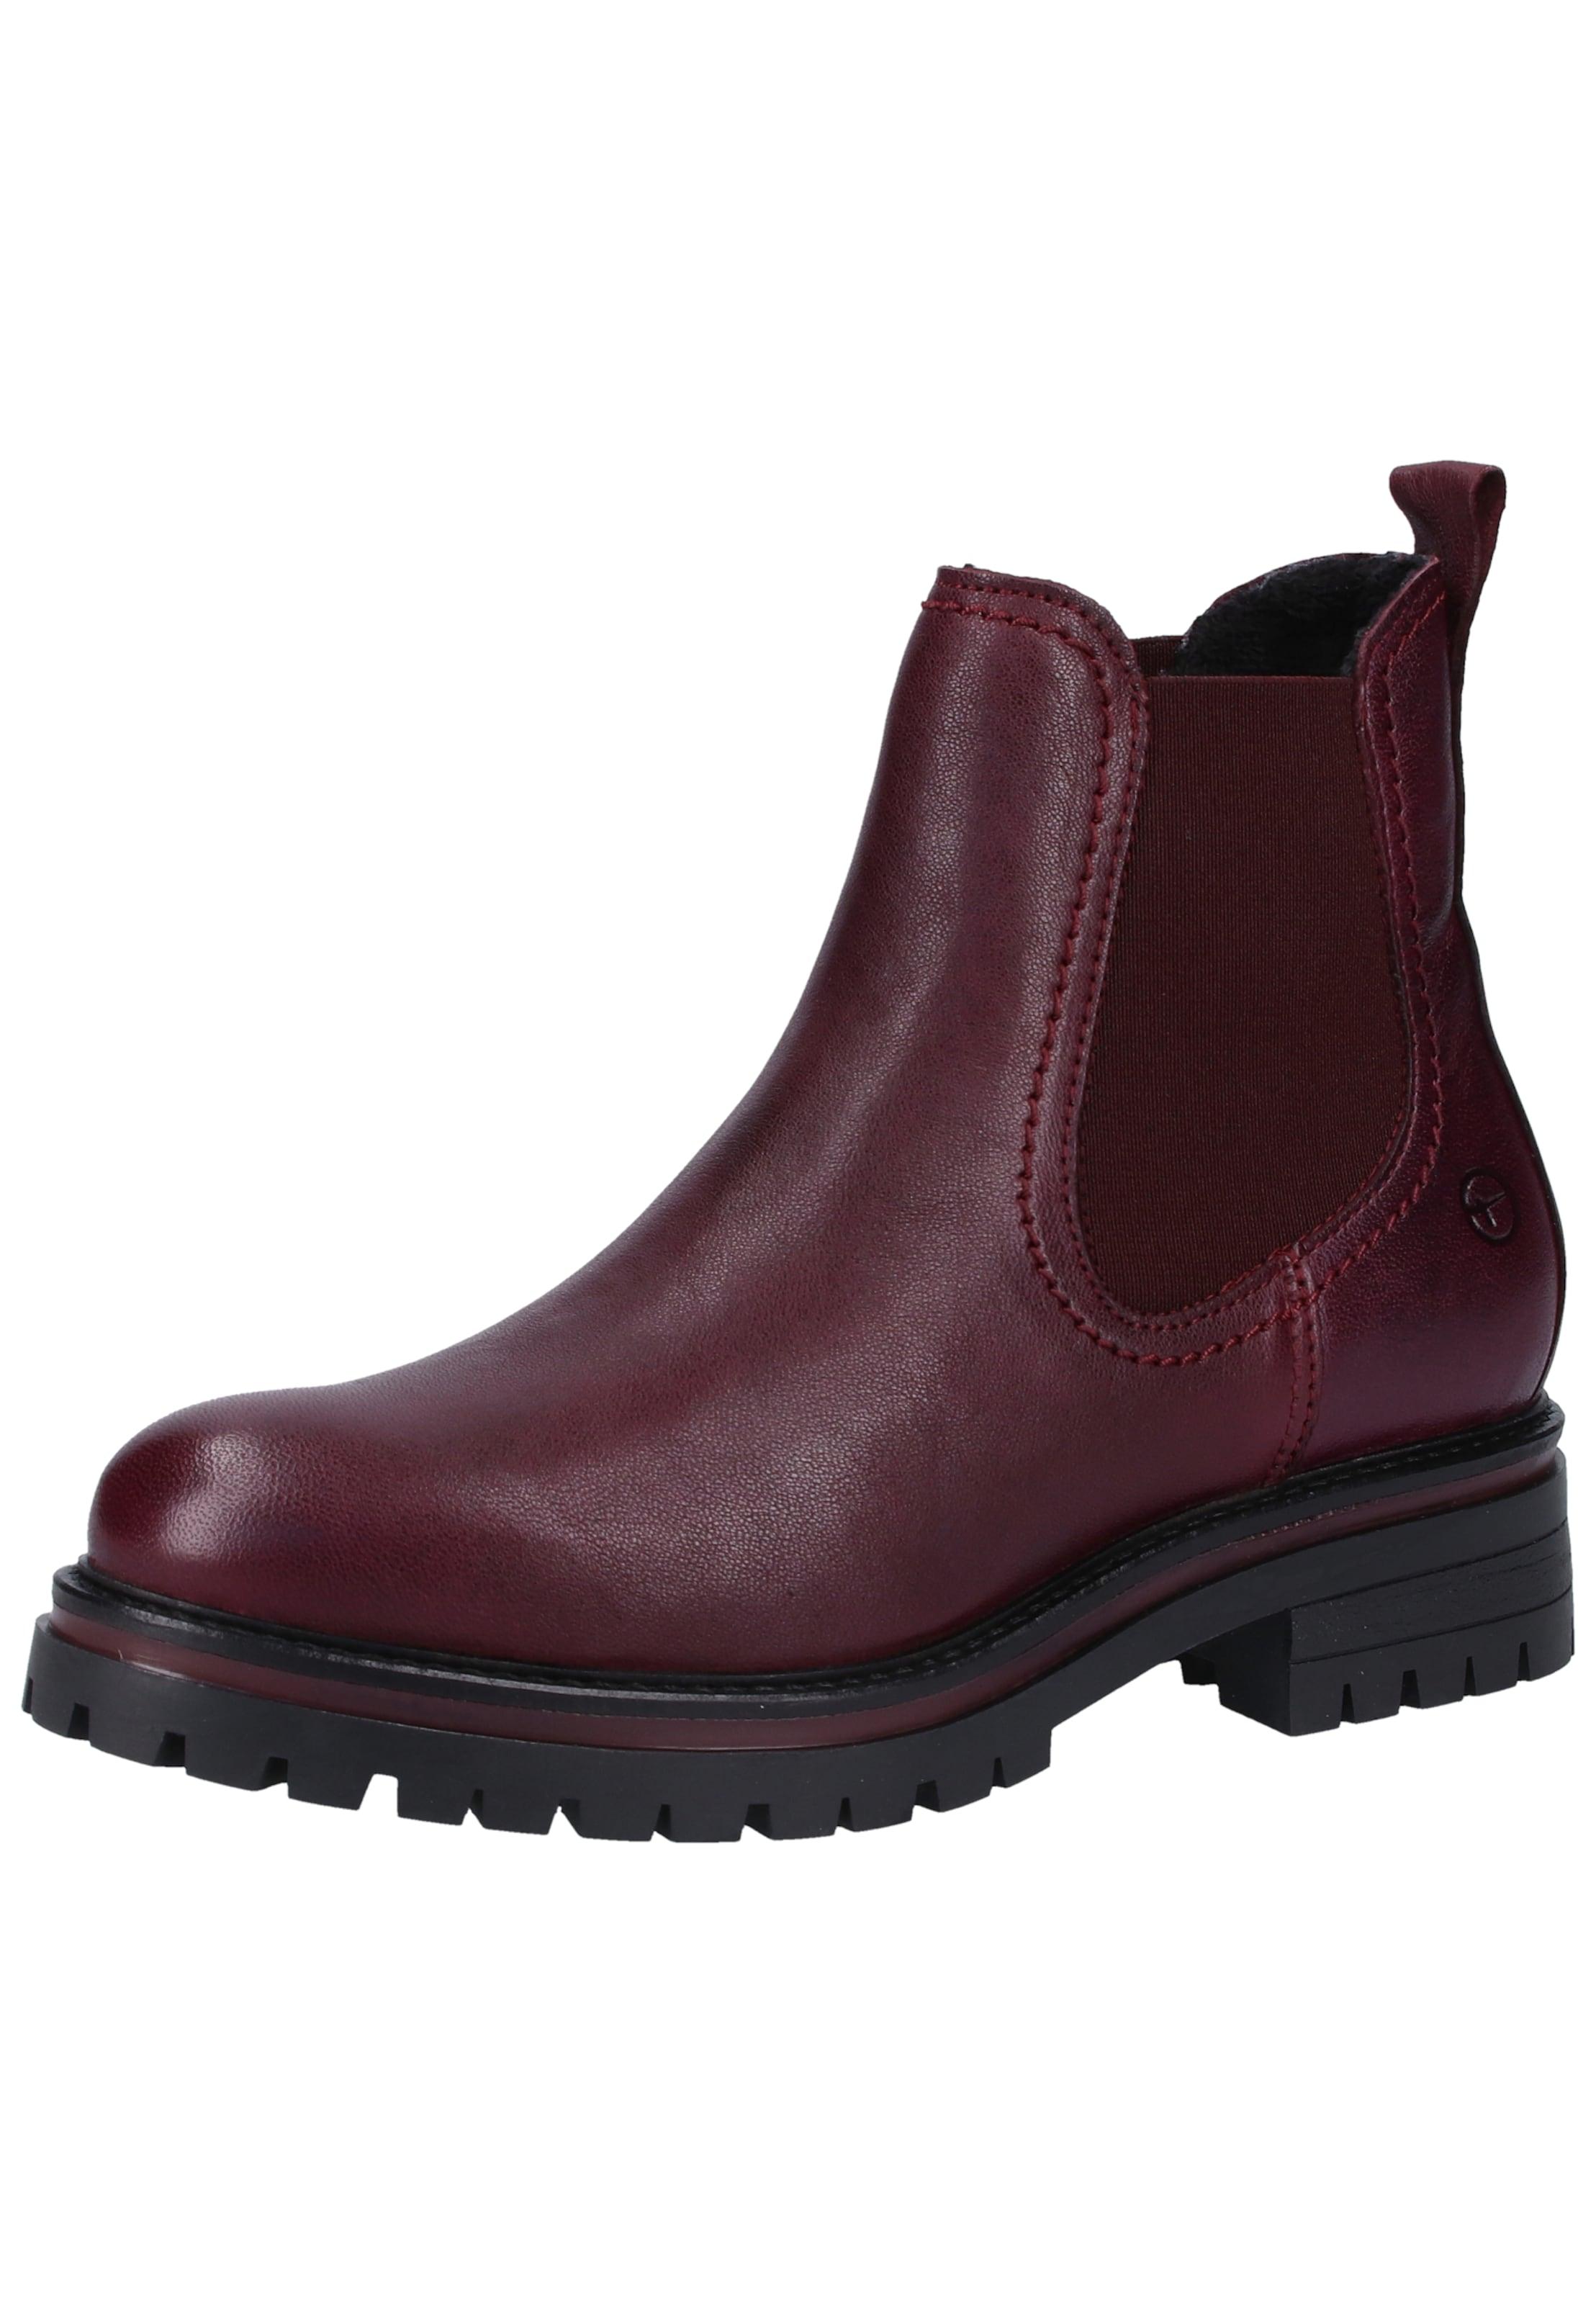 Rouge Boots Tamaris Tamaris Chelsea Boots En Chelsea wNm8n0v